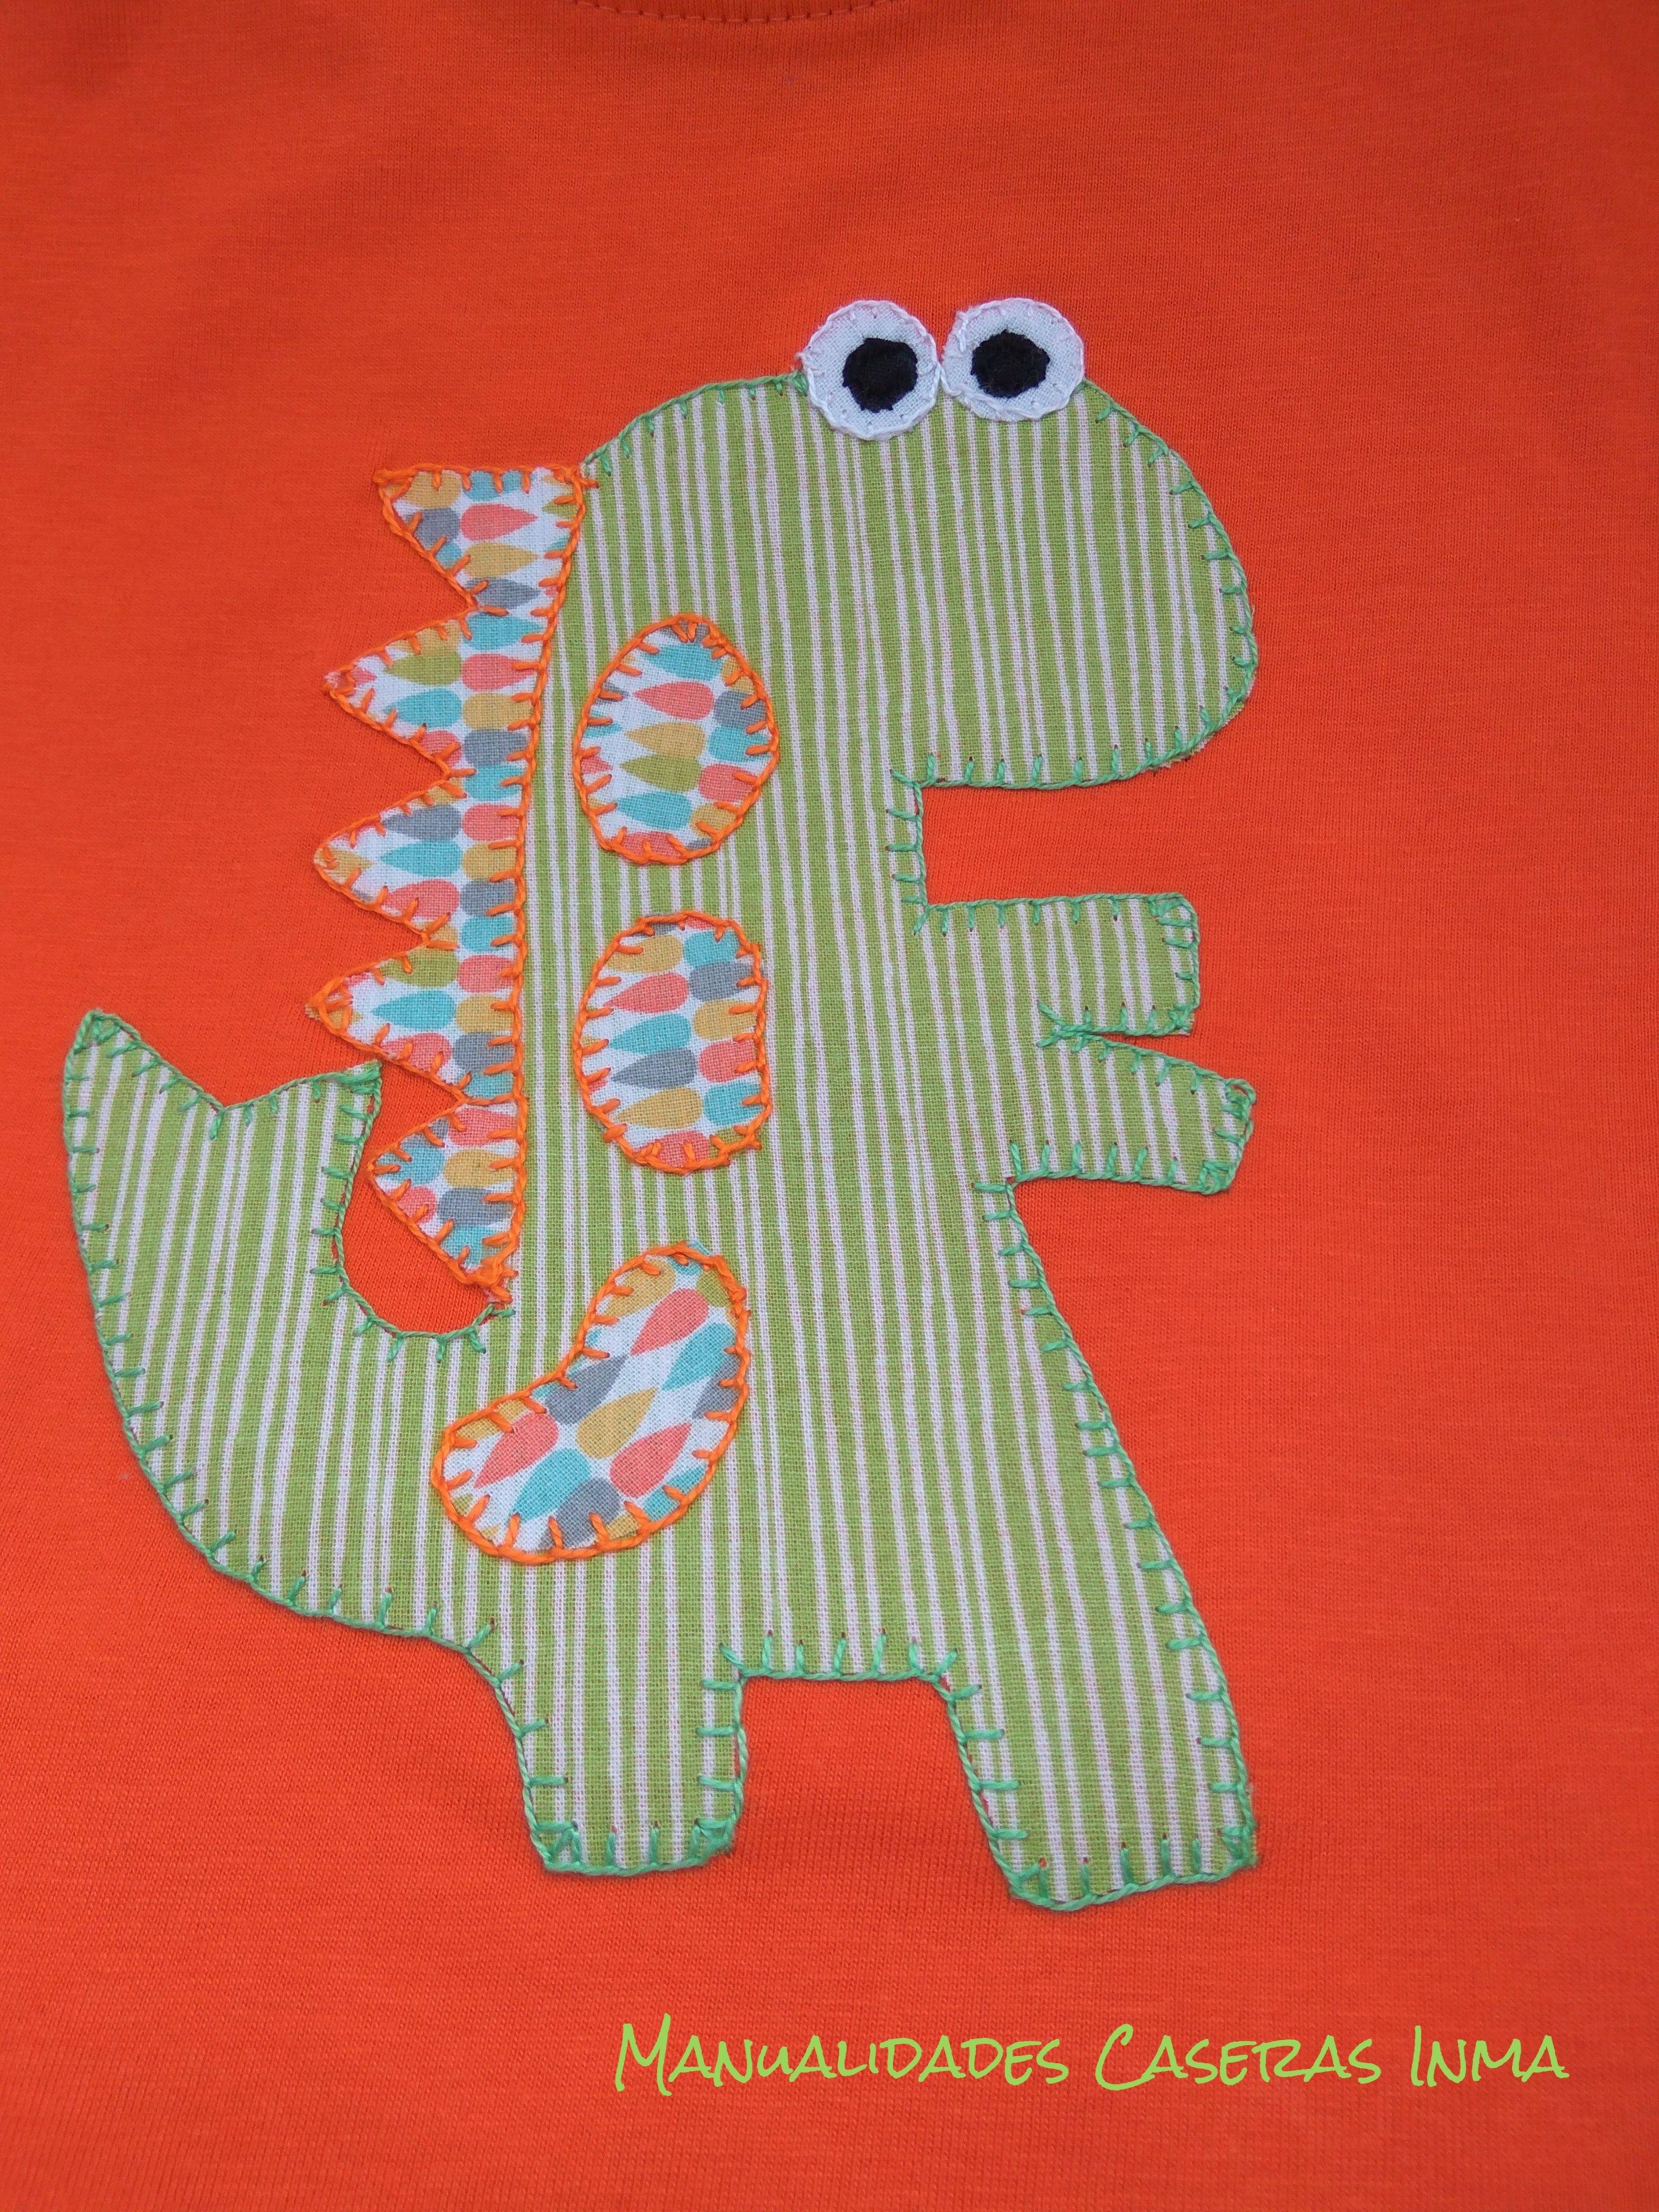 Manualidades Caseras Inma_ Camiseta dinosaurios en naranja detalle